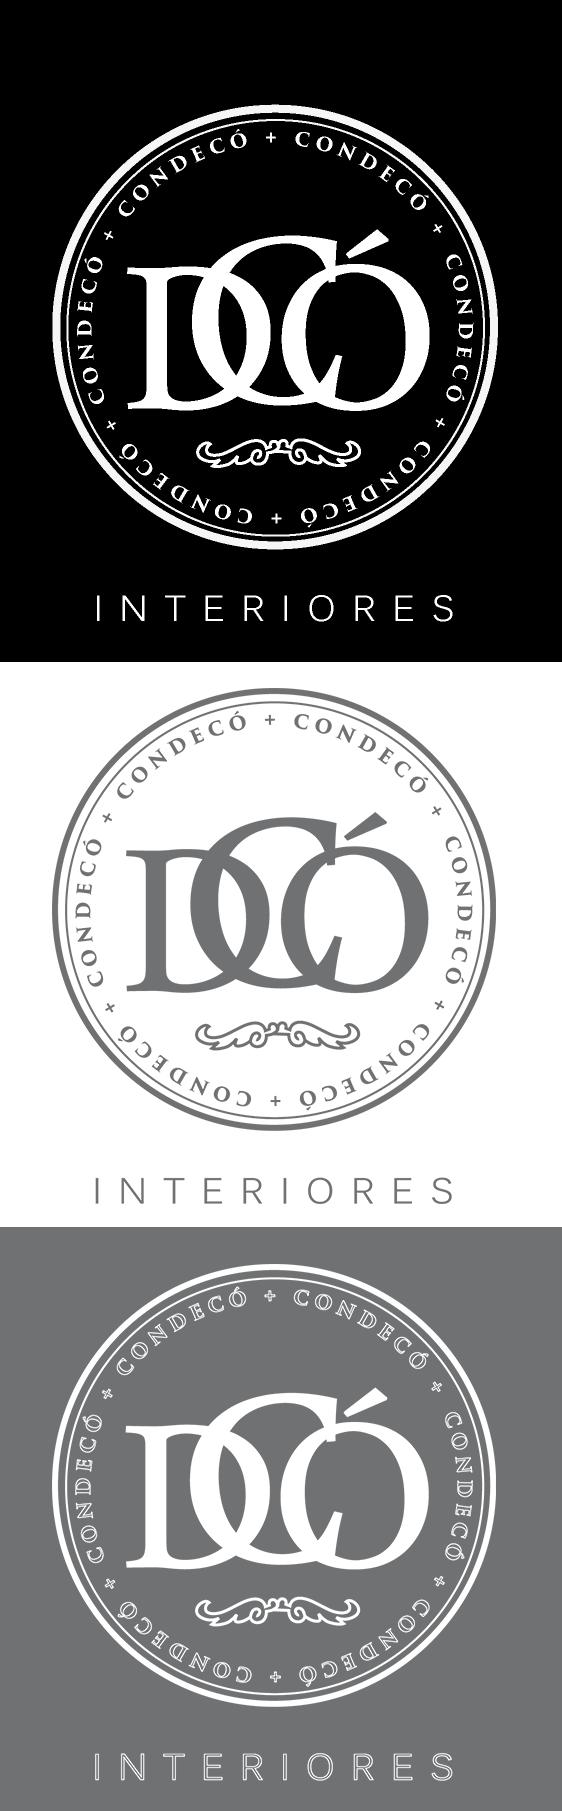 Logo Design: Condeco by pixelartkid